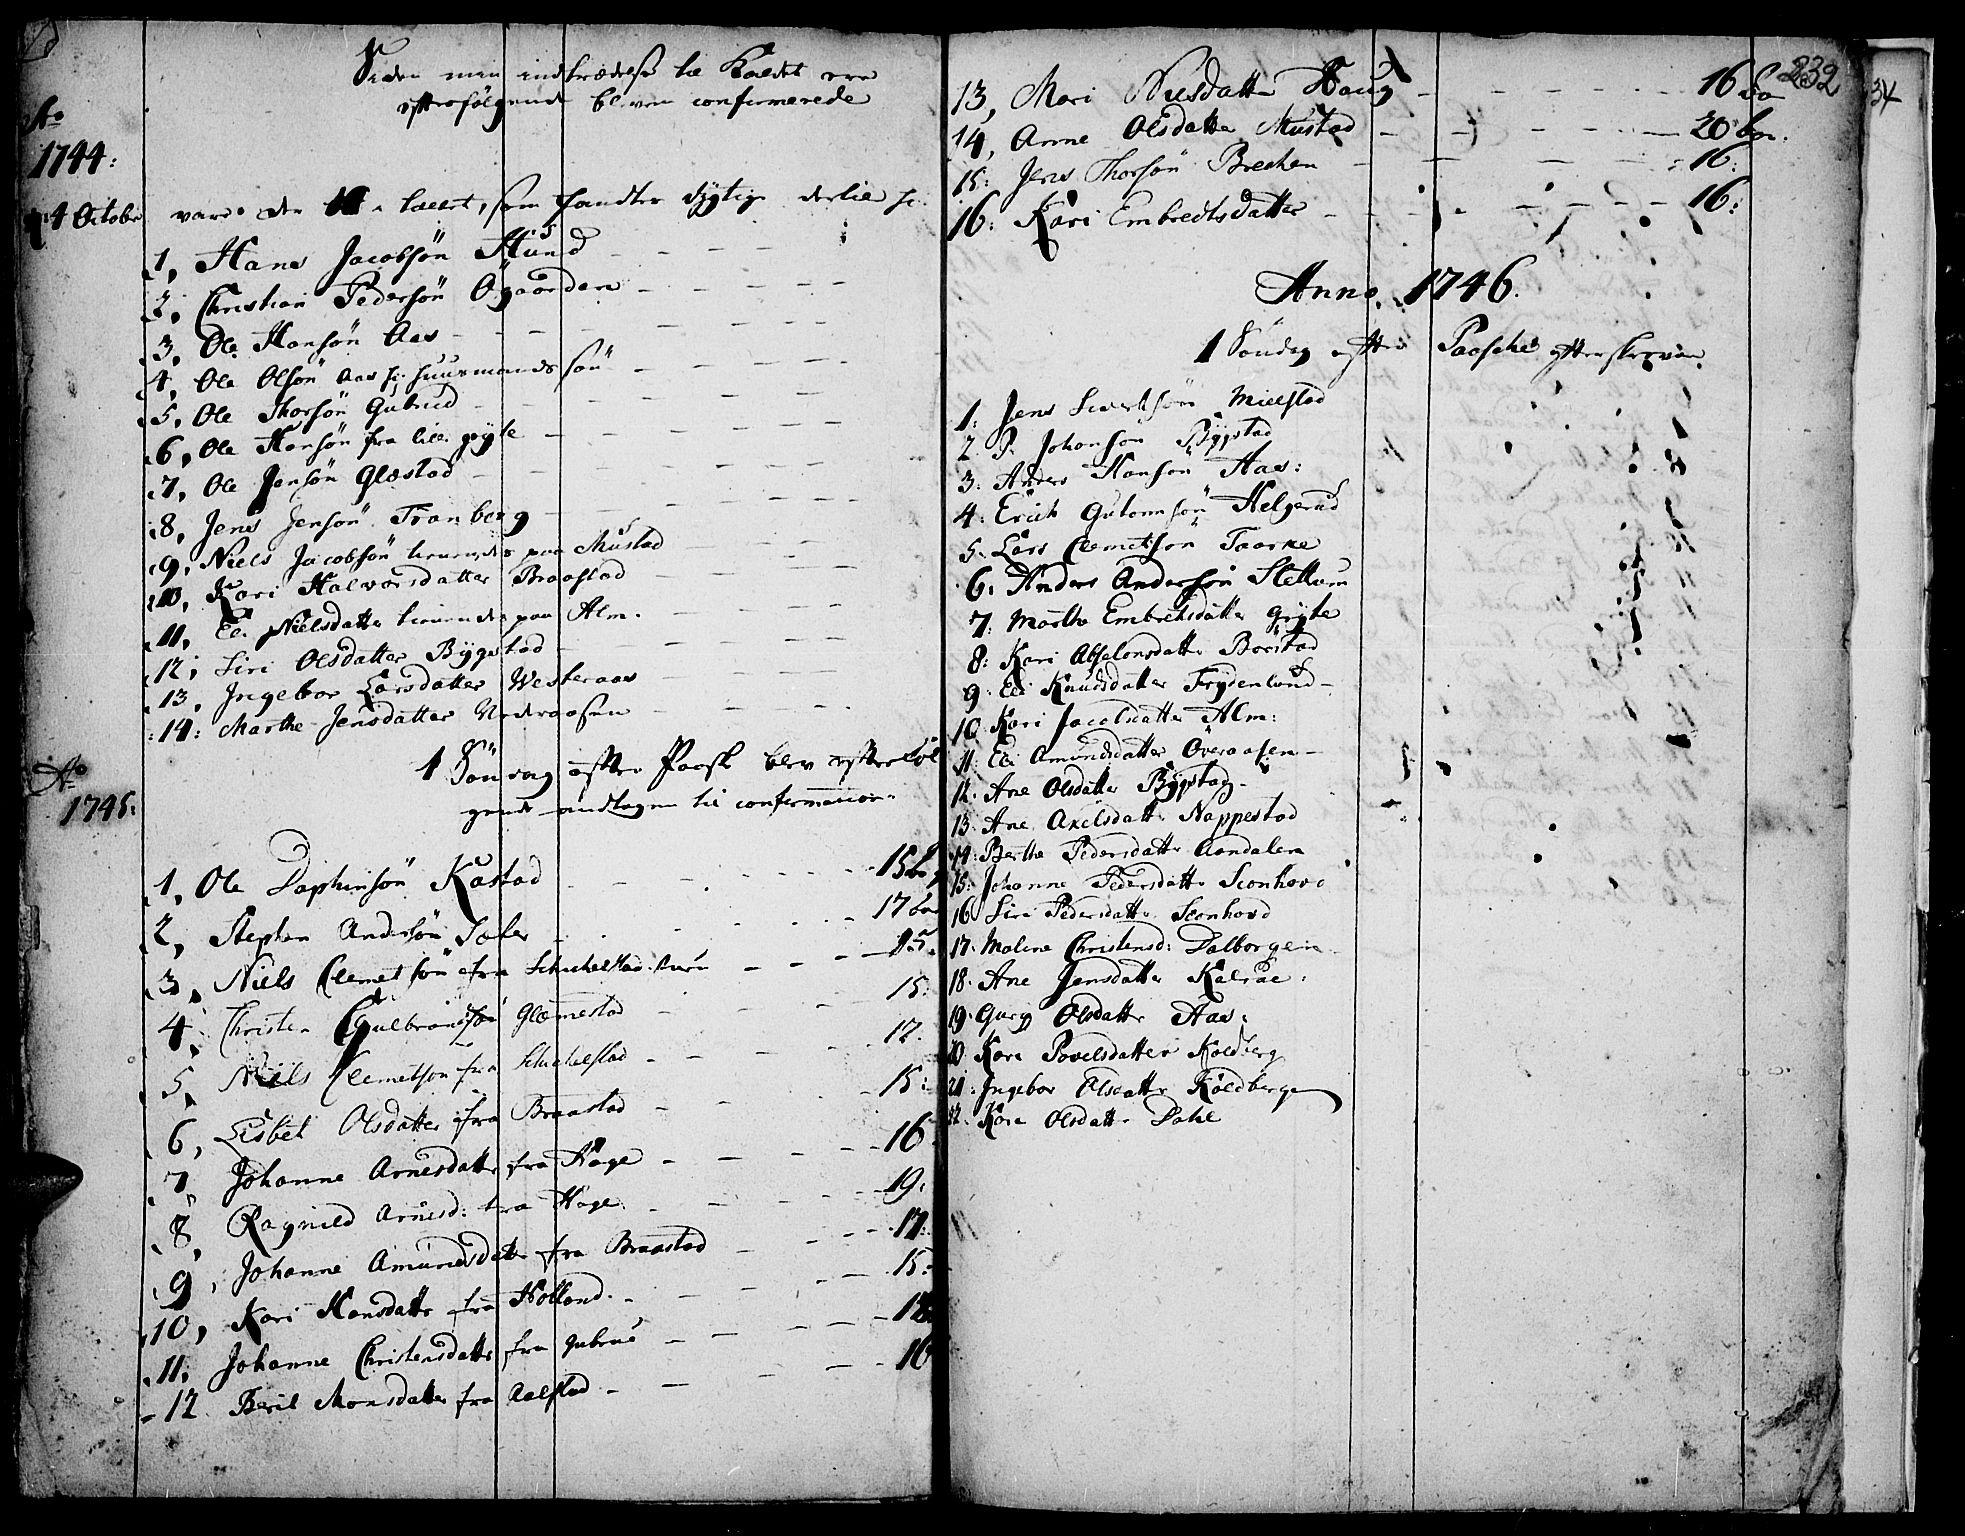 SAH, Vardal prestekontor, H/Ha/Haa/L0001: Ministerialbok nr. 1, 1706-1748, s. 232